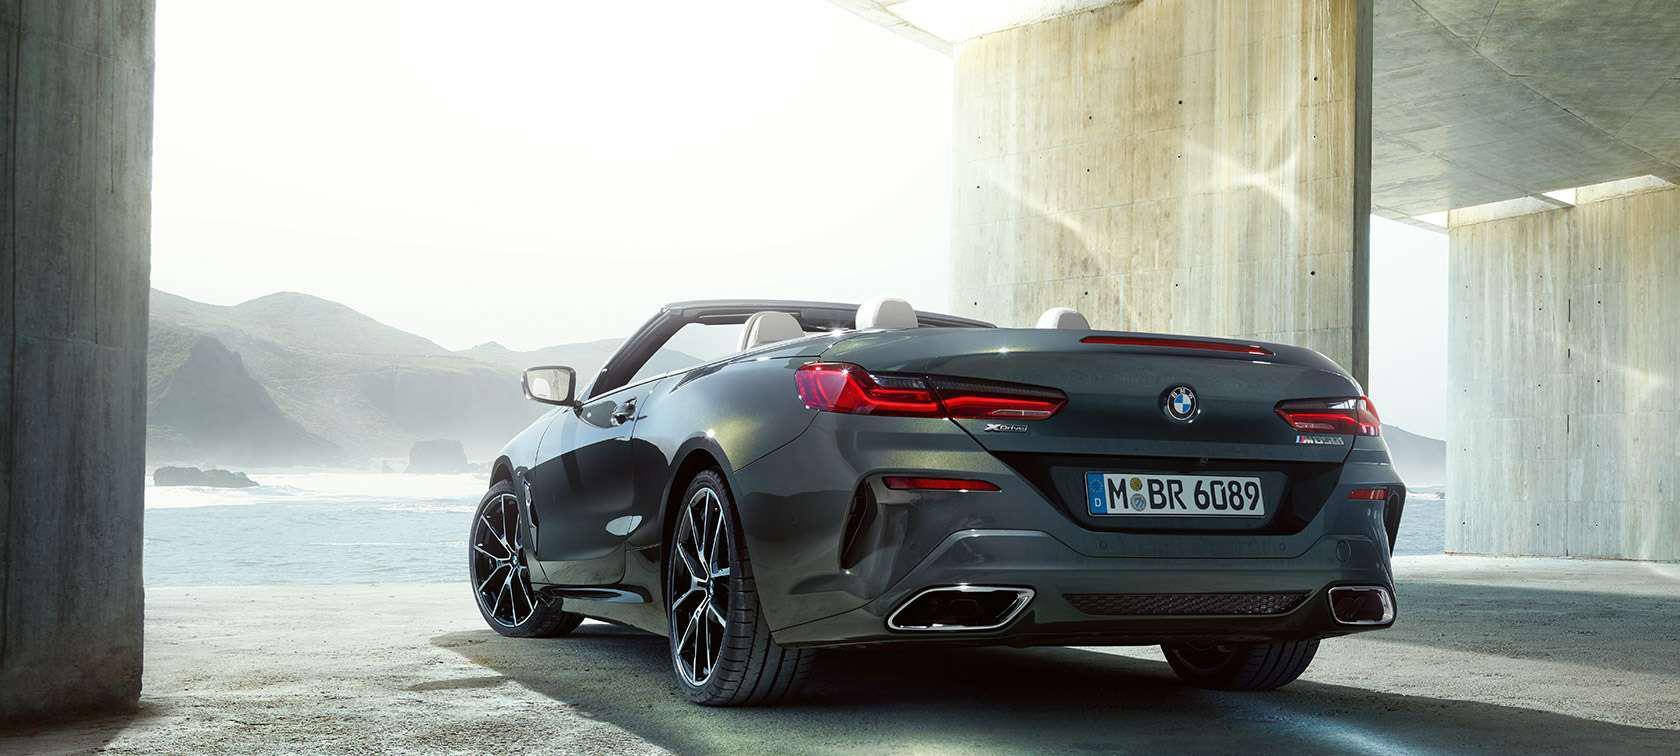 Yeni BMW 8 Serisi Cabrio